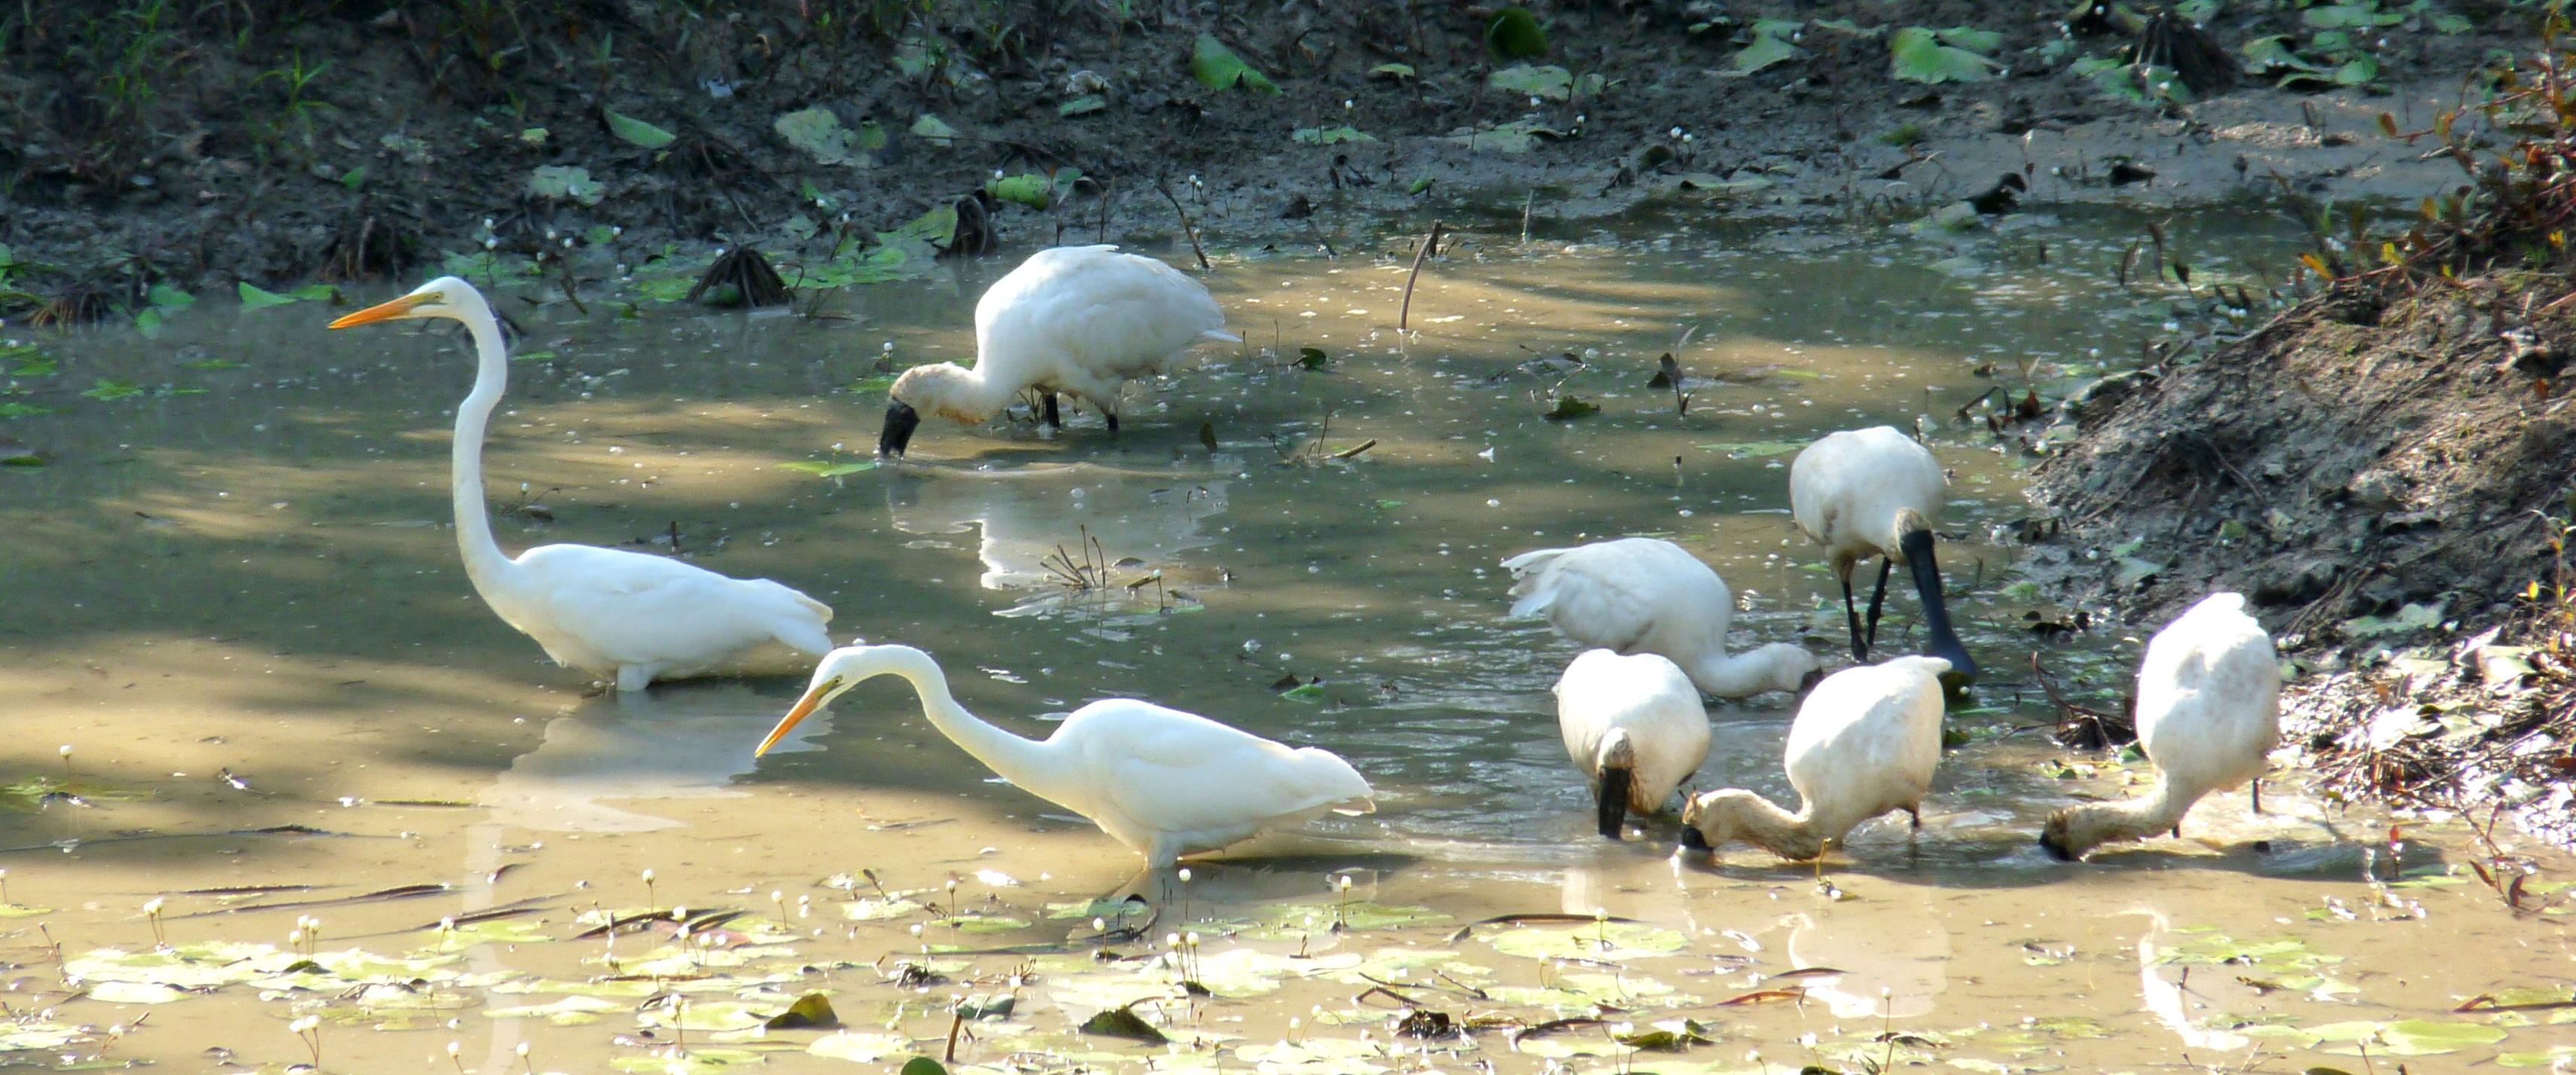 Spoonbills & Egrets feeding